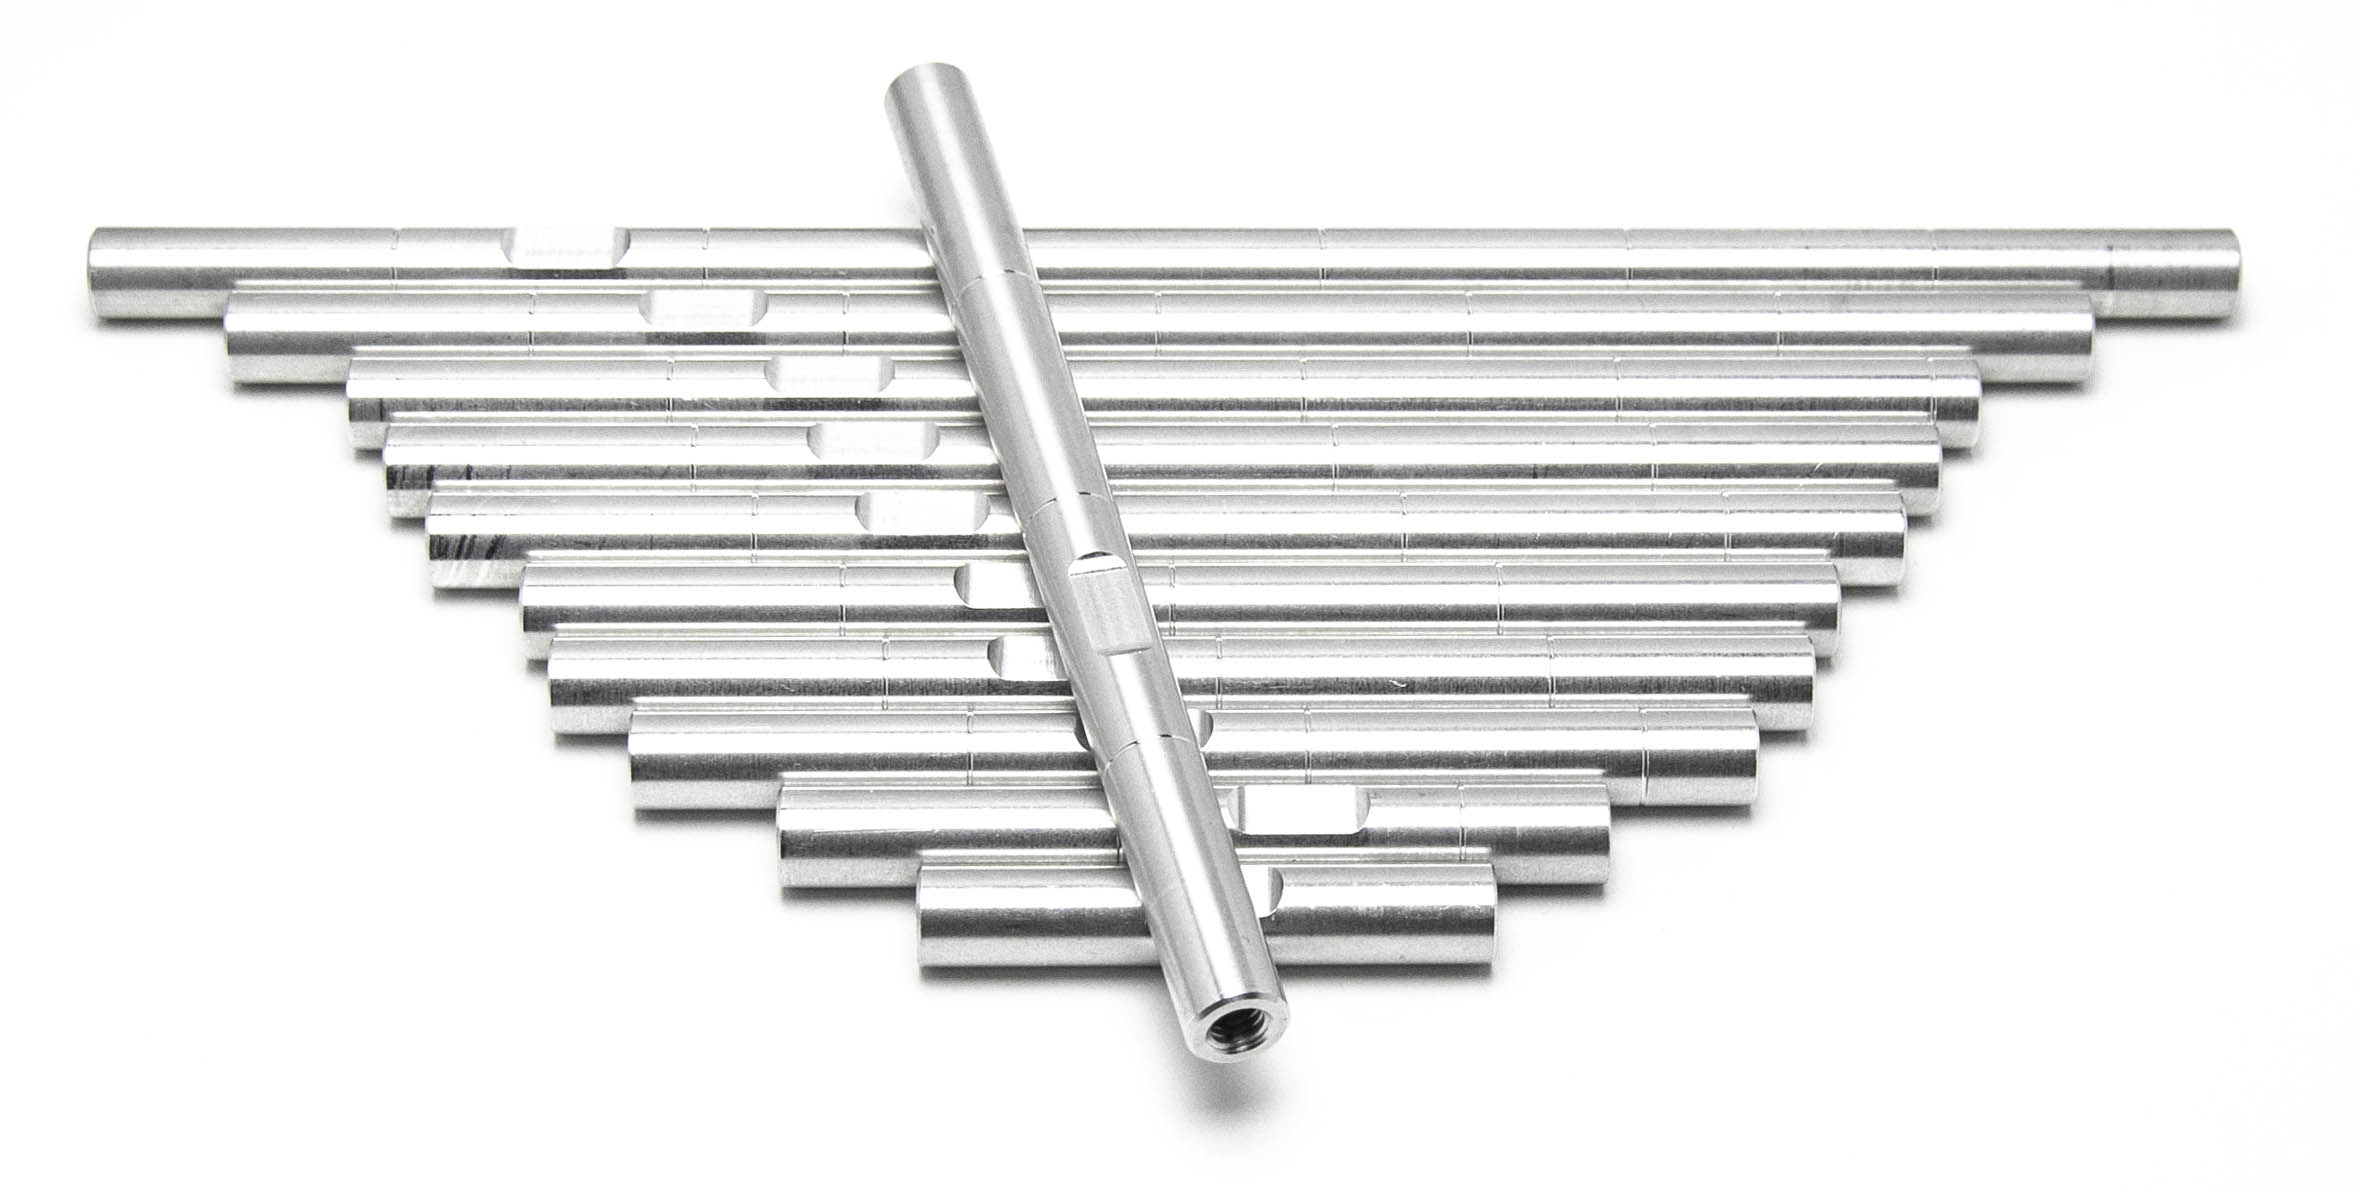 16x Aluminium Rod raw